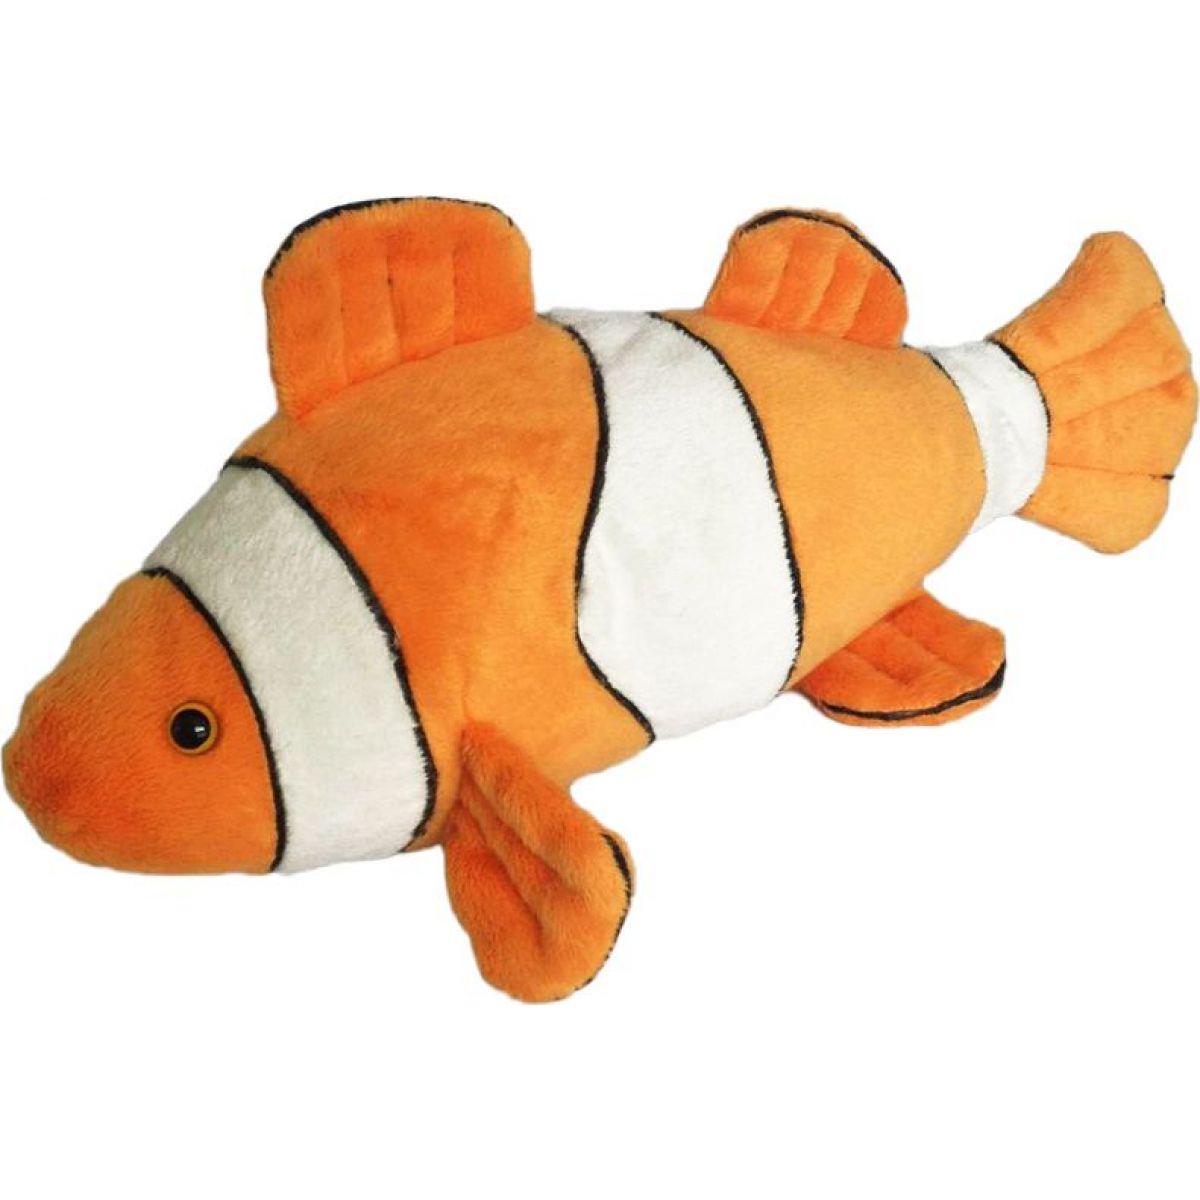 Hm Studio rybička 28 cm